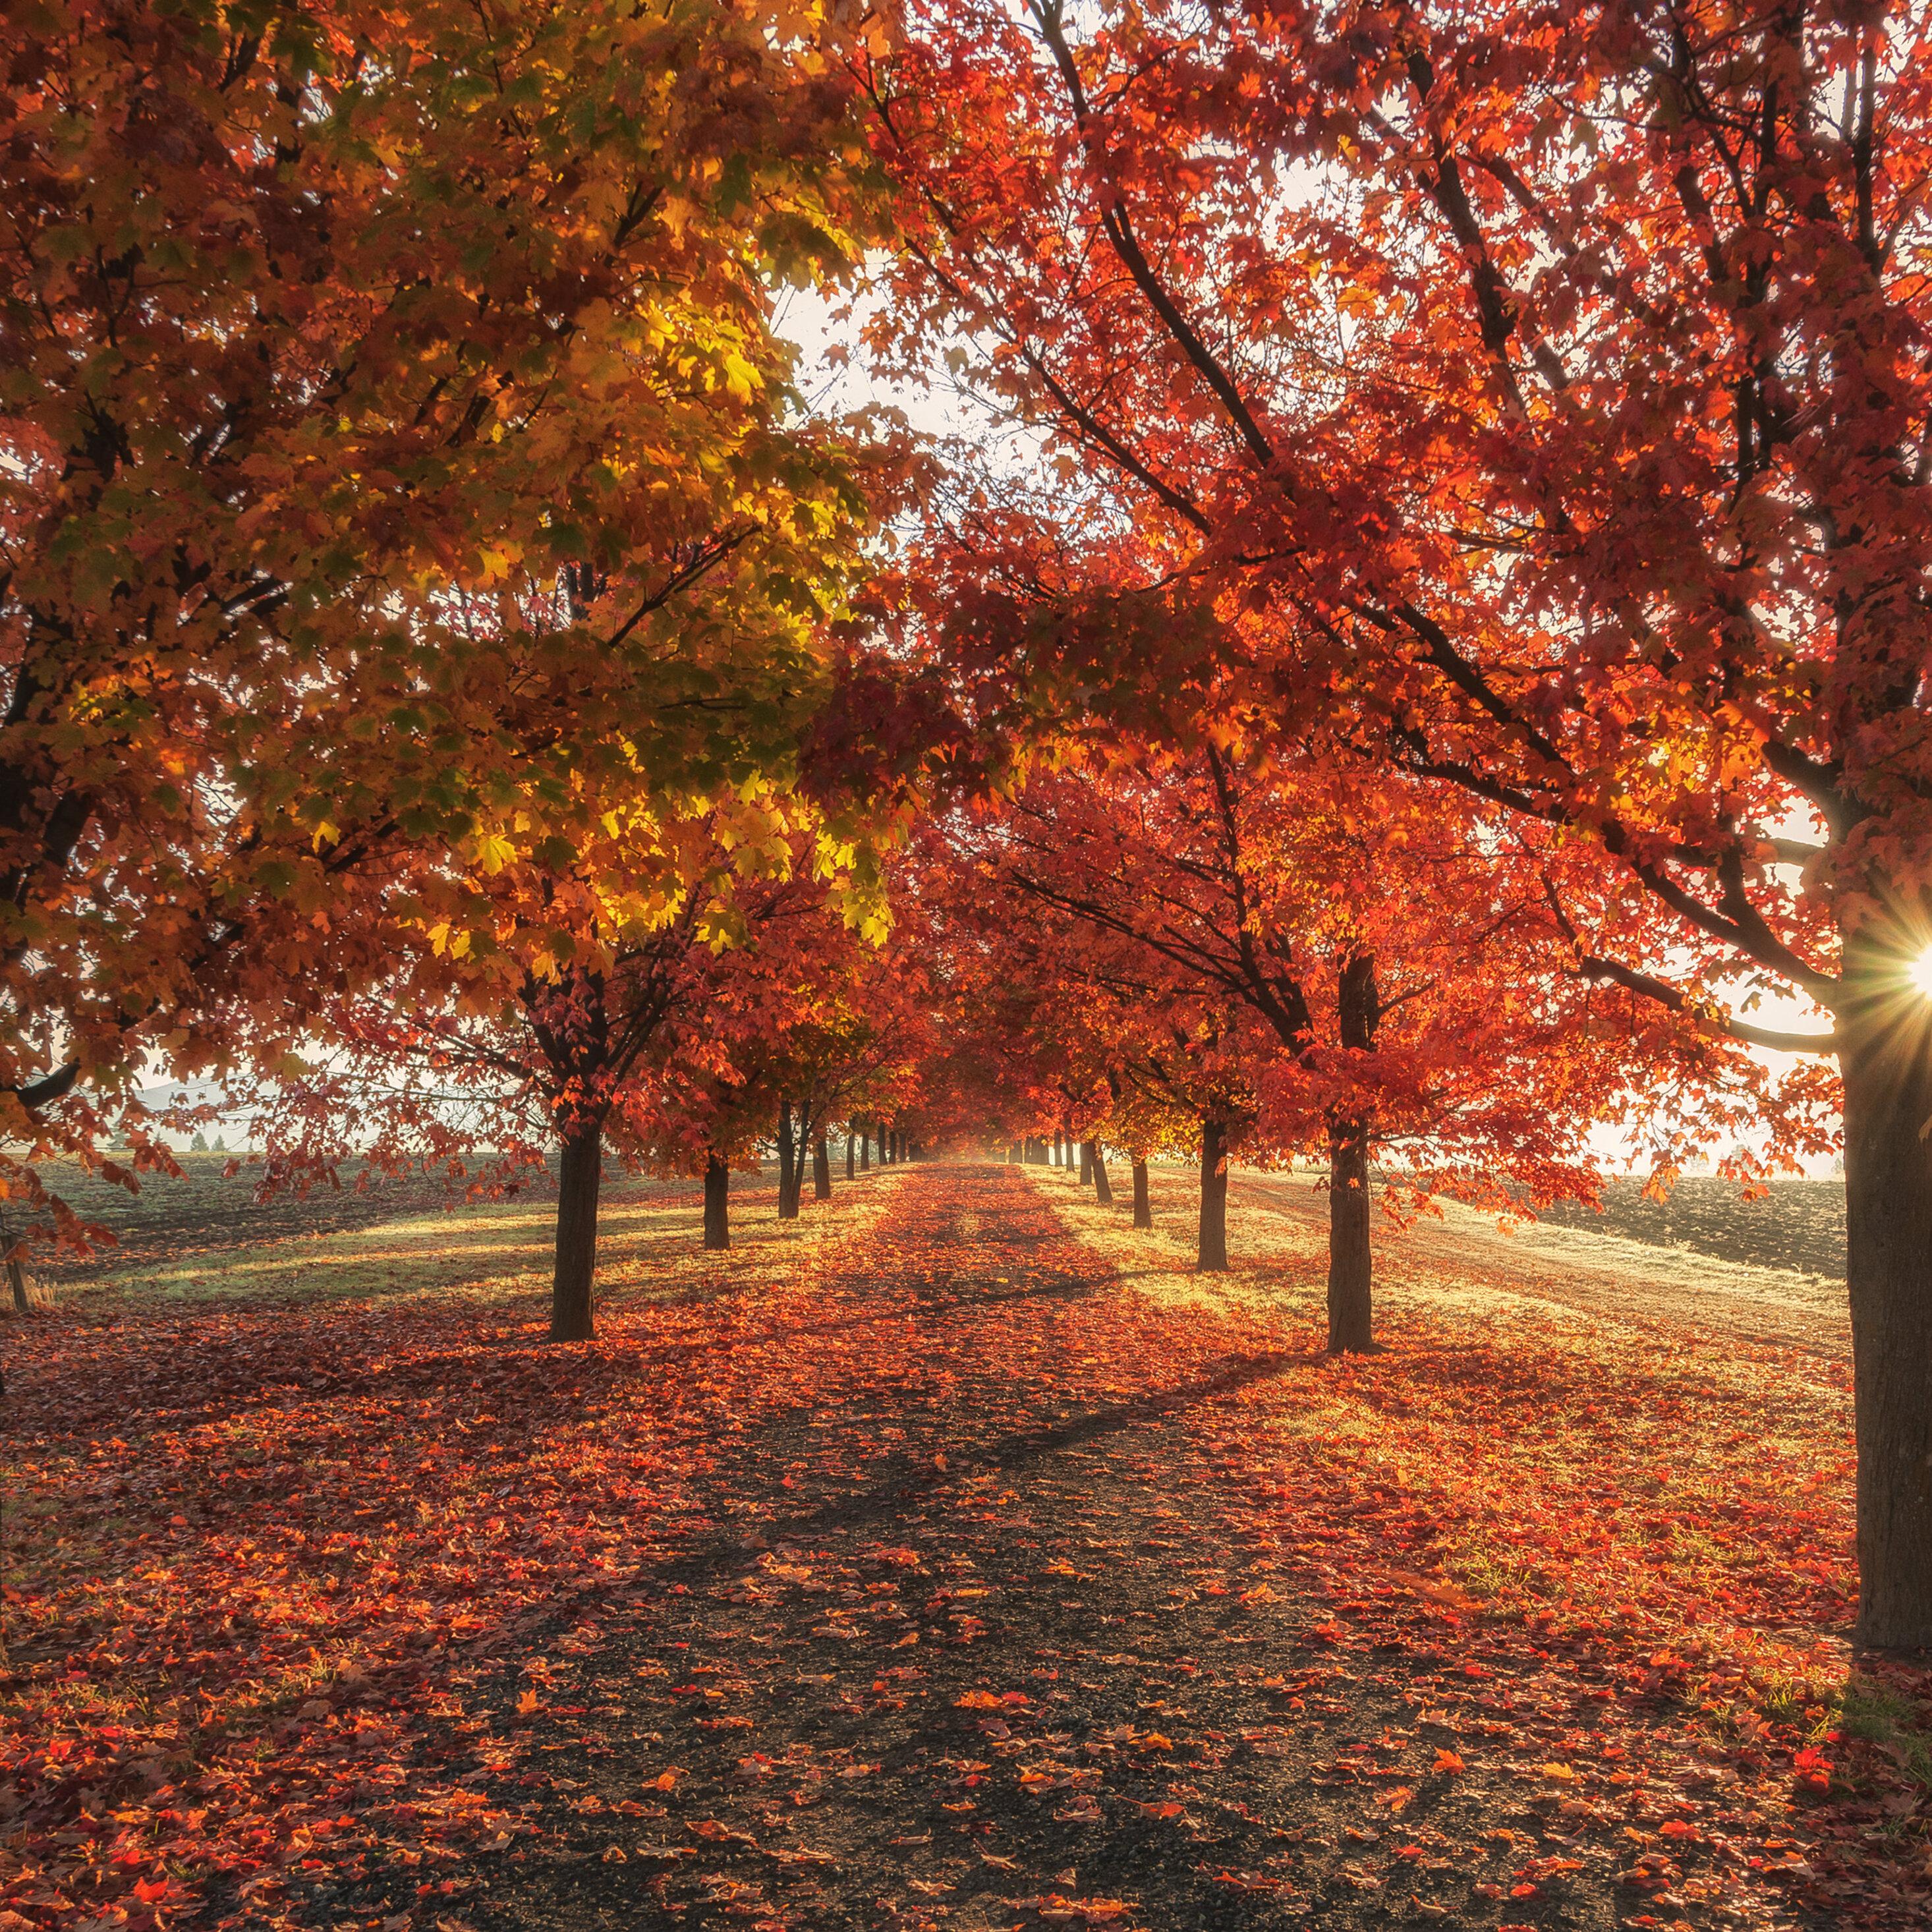 2932x2932 Autumn Fall Season Trees 4k Ipad Pro Retina